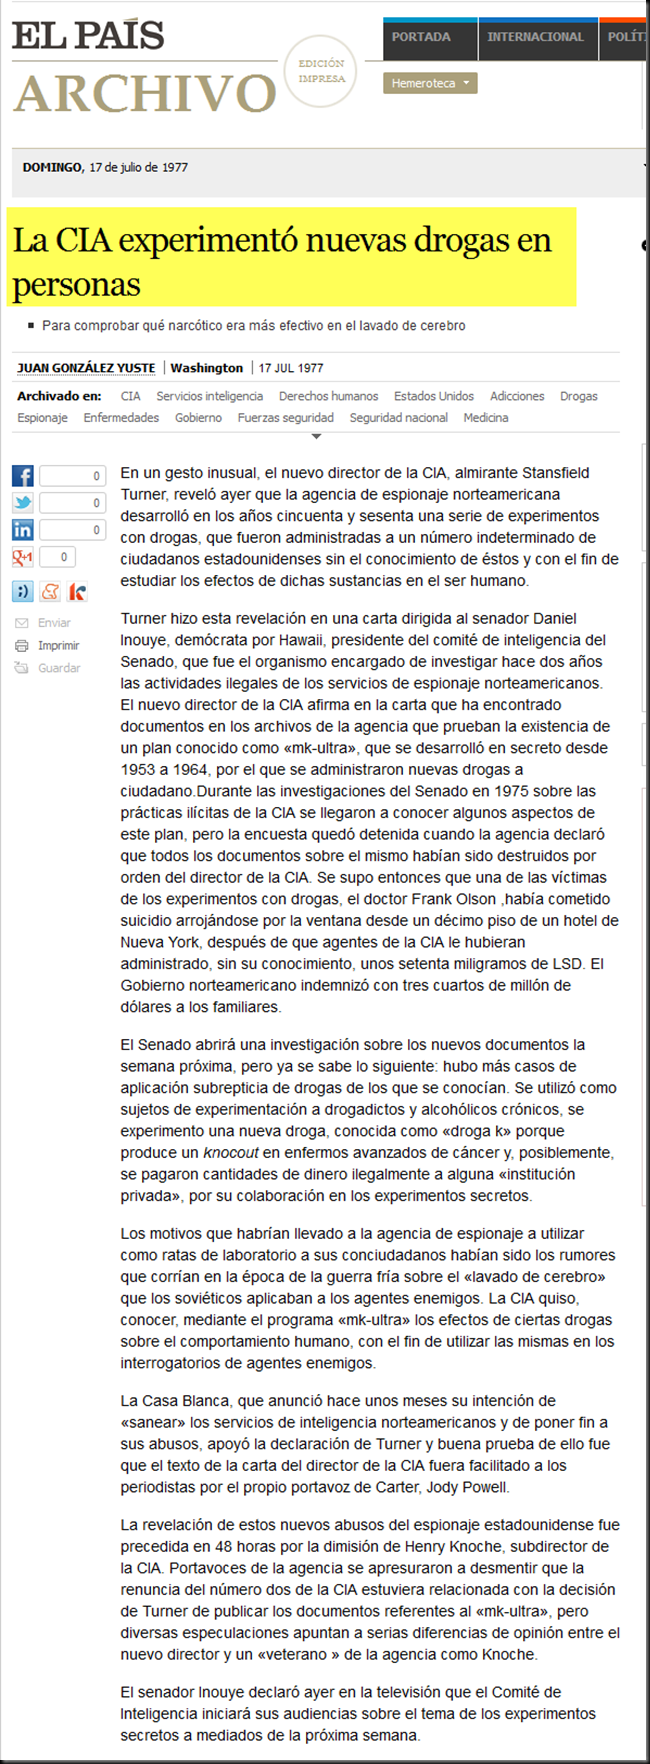 MK Ultra en la prensa española Image_thumb8